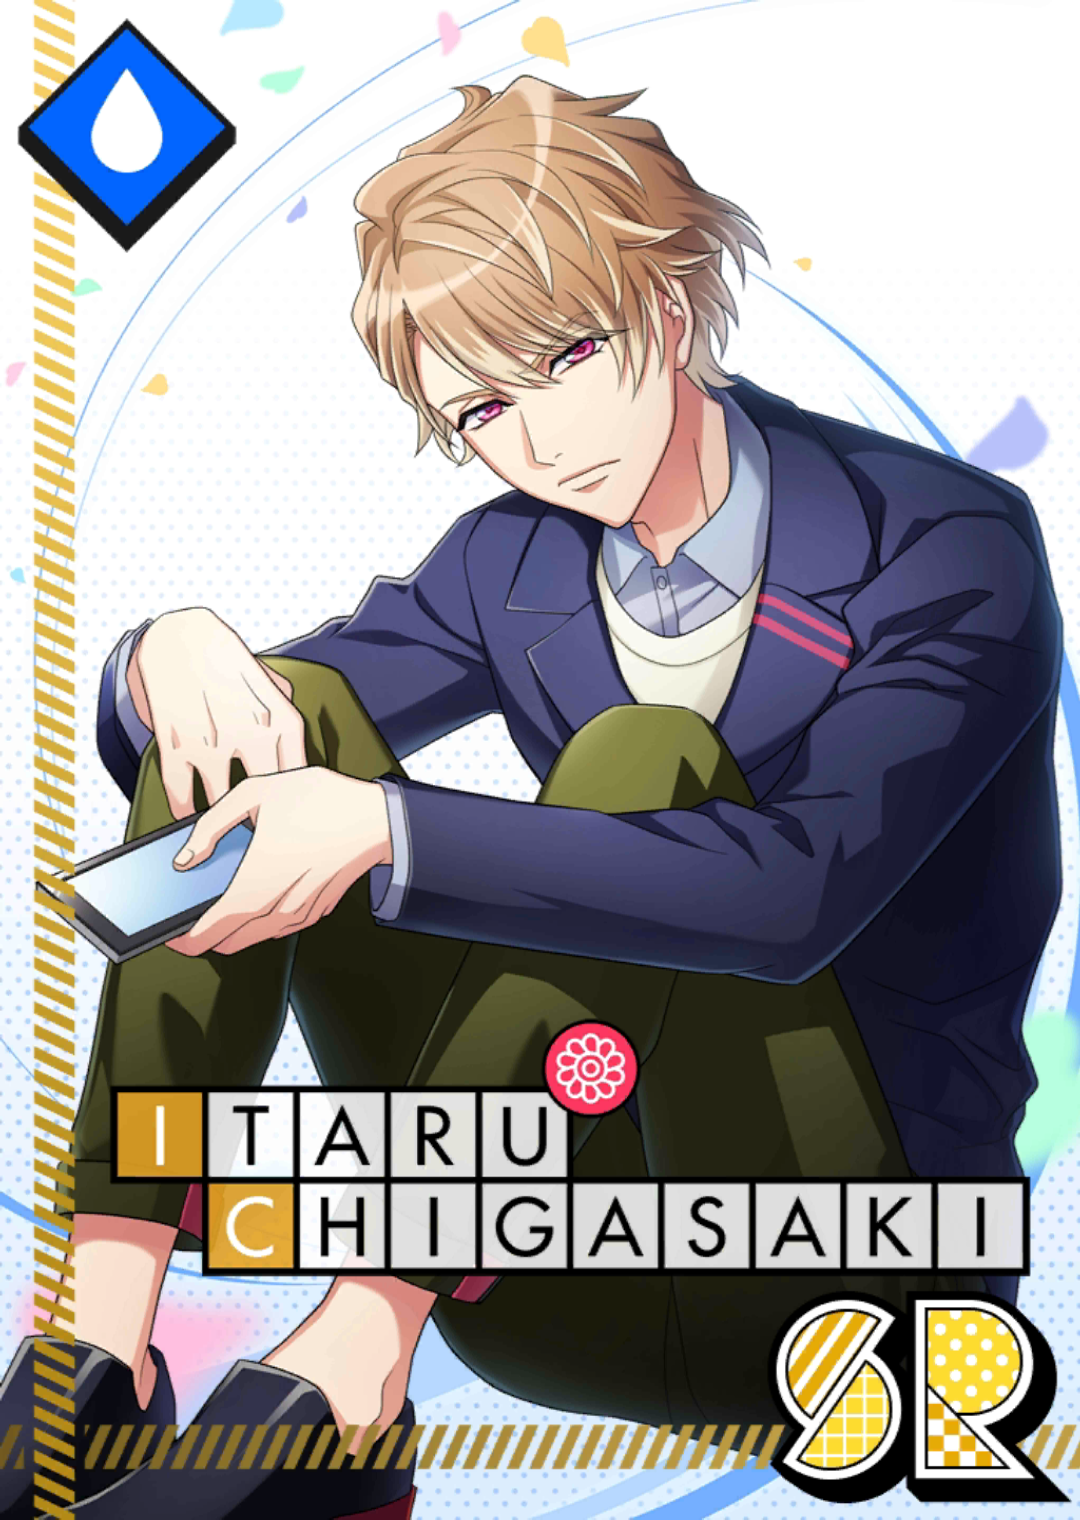 Itaru Chigasaki SR No Signal unbloomed.png